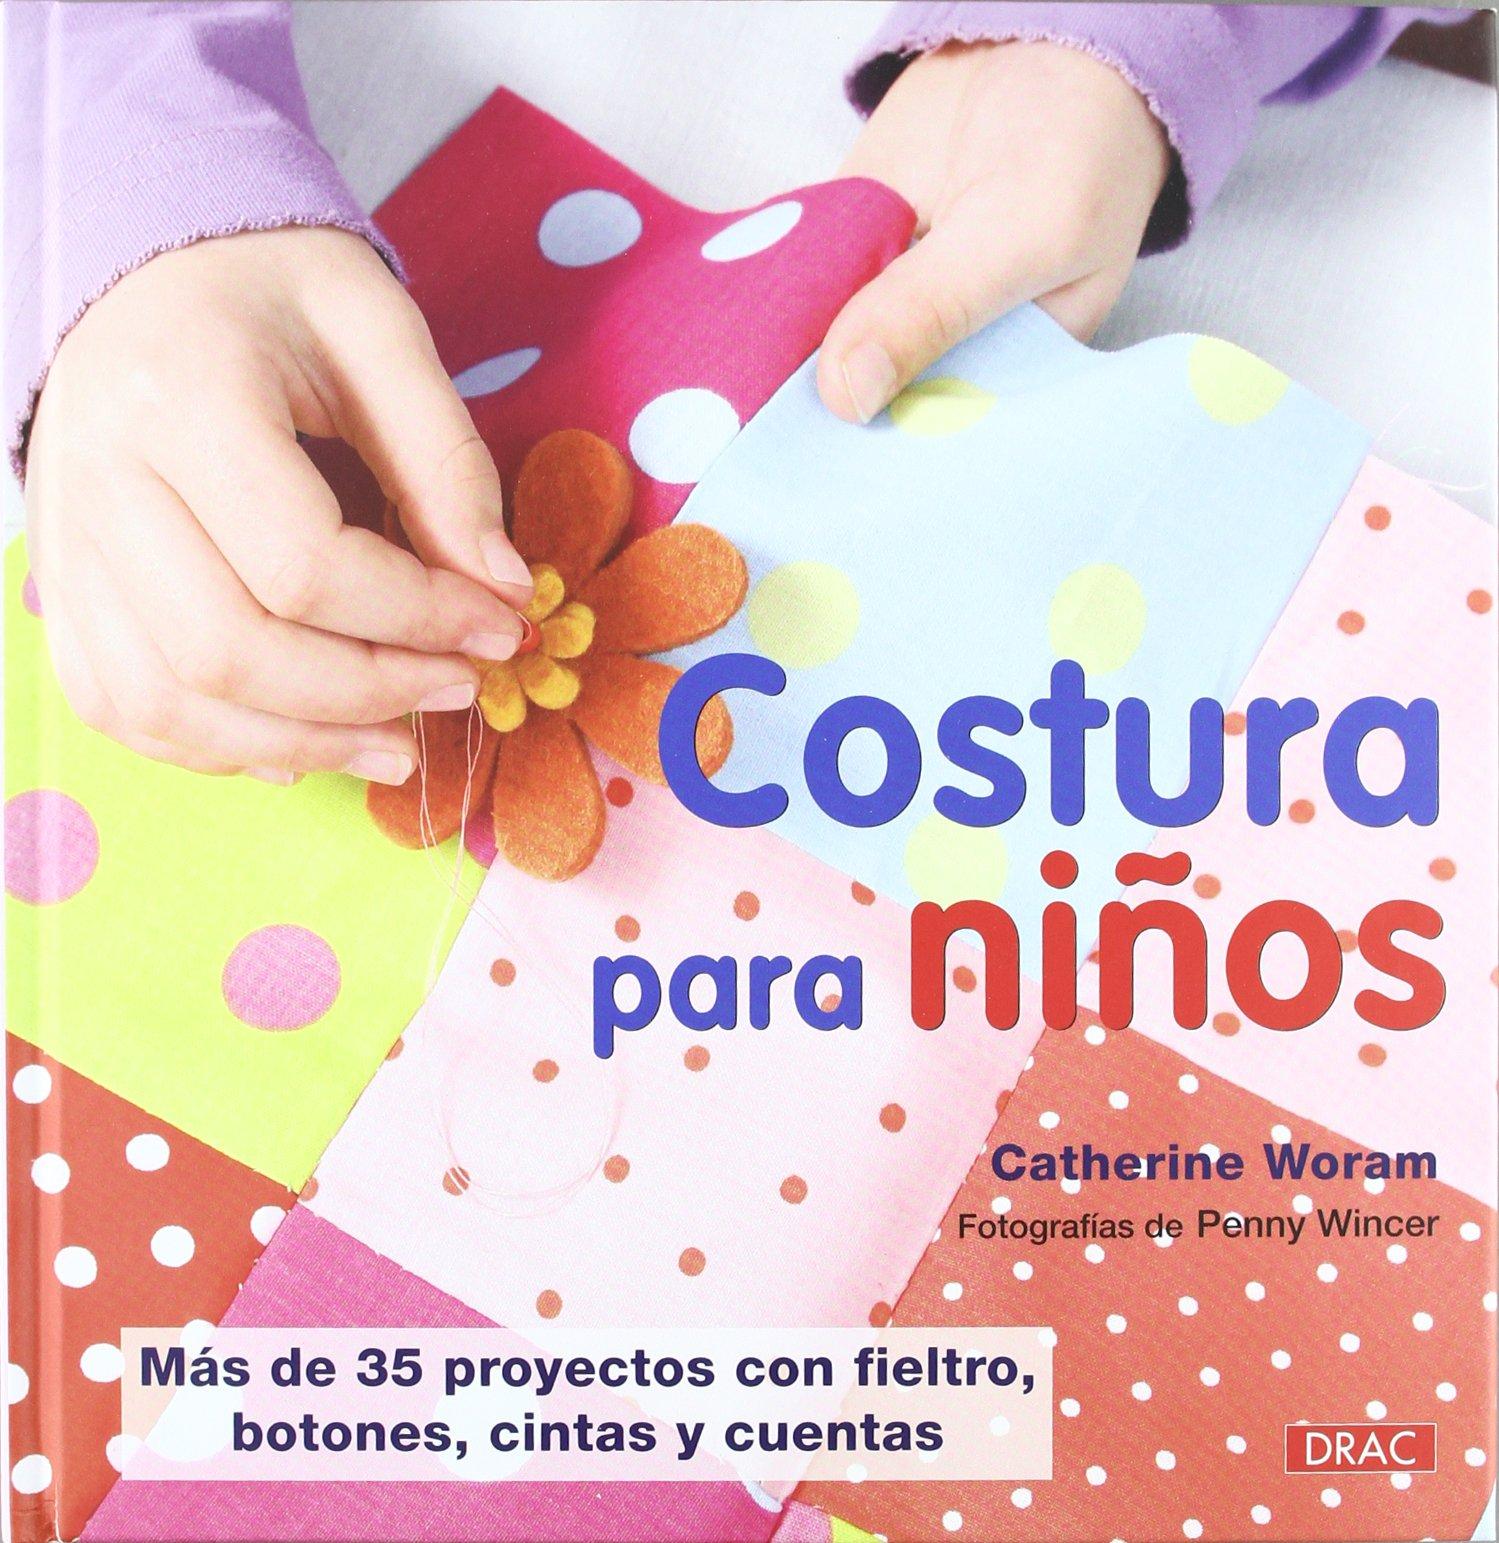 COSTURA PARA NIÑOS (Costura (drac)): Amazon.es: Woram, Catherine ...